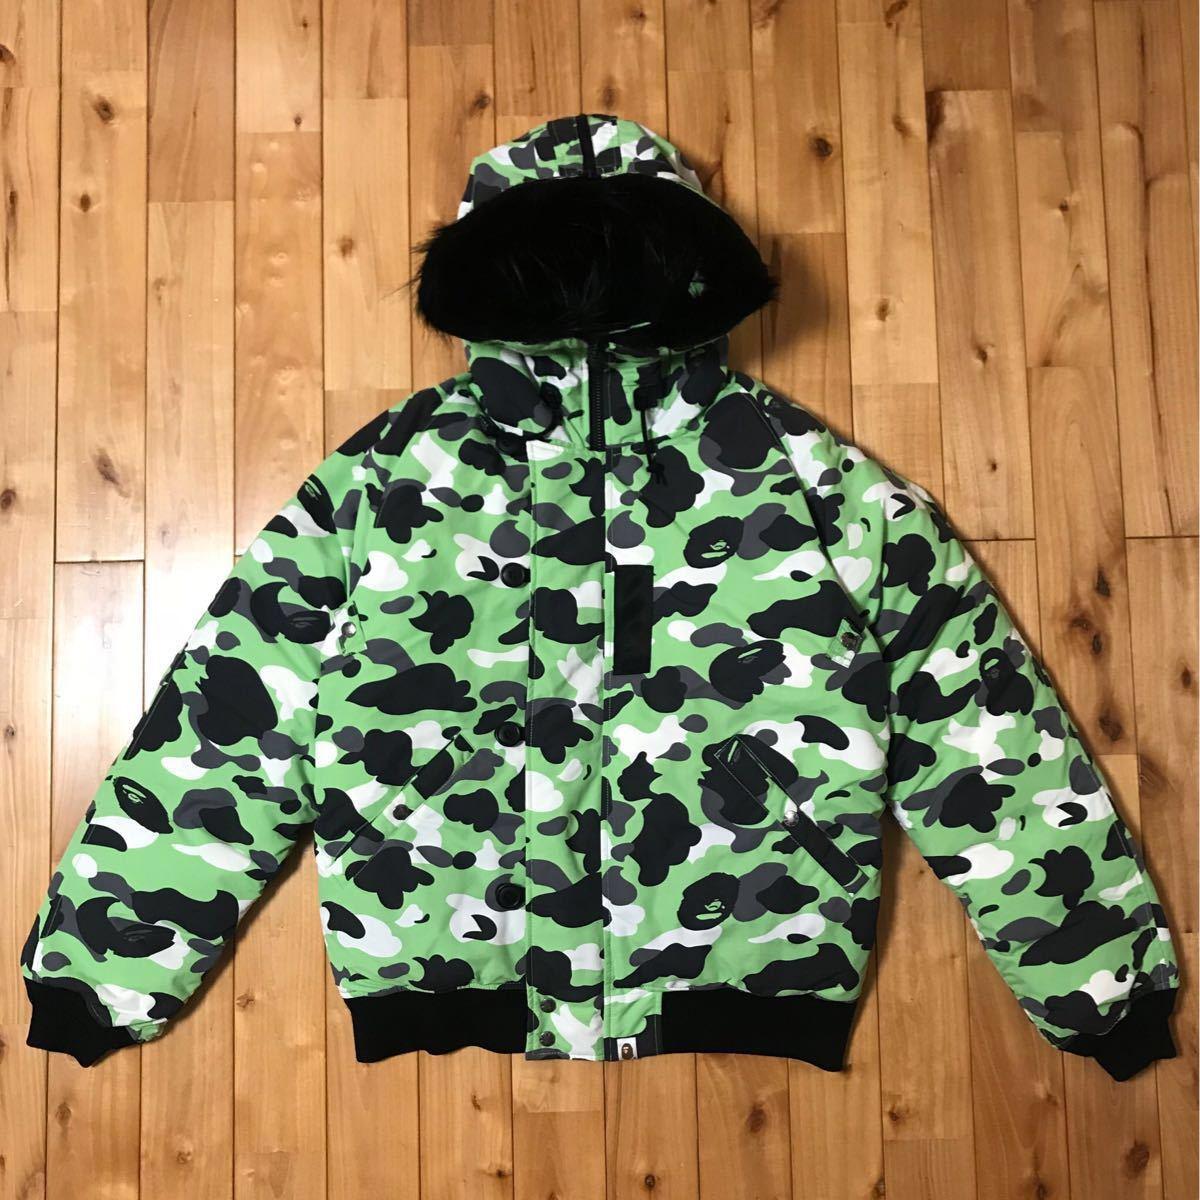 ★XL★ ファー付き ダウンジャケット FUR hoodie down jacket a bathing ape bape エイプ ベイプ アベイシングエイプ 1st camo 迷彩